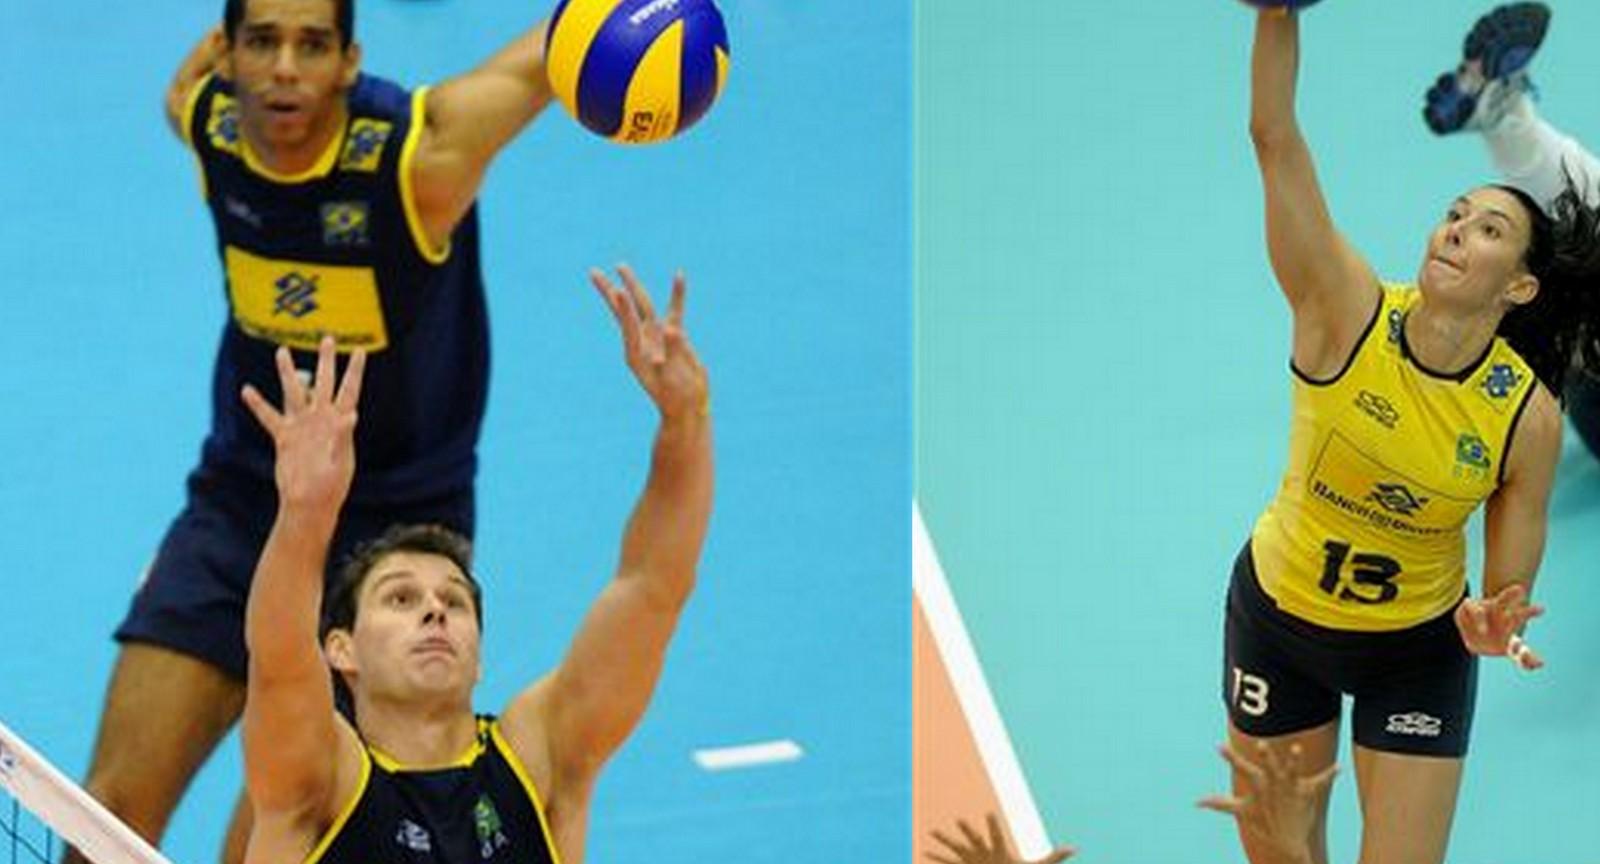 2012 Olympics1